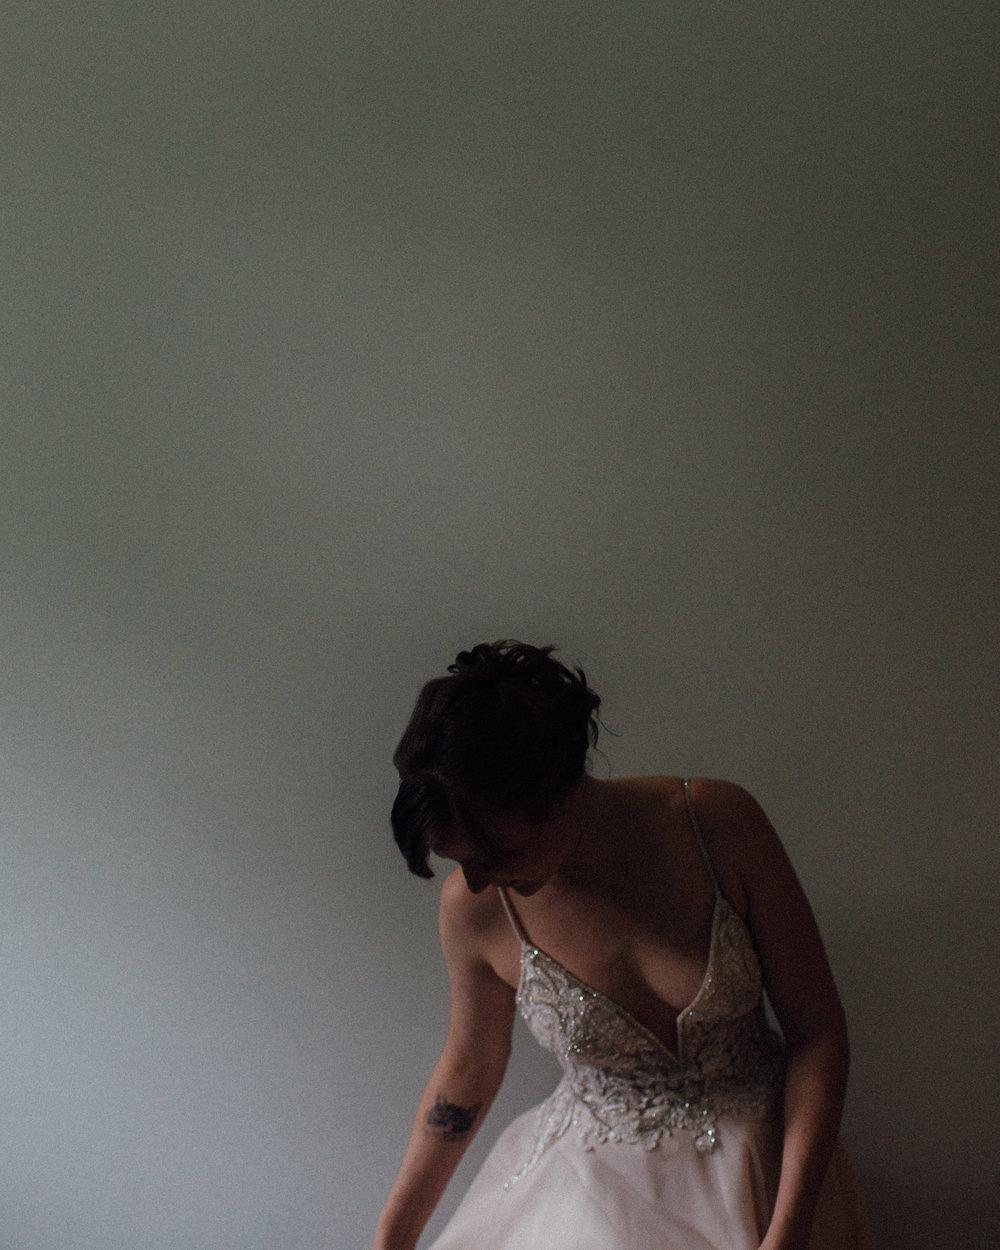 dahlonega_juliette_chapel_photojournalism_atlanta_wedding_photographers_1191.jpg